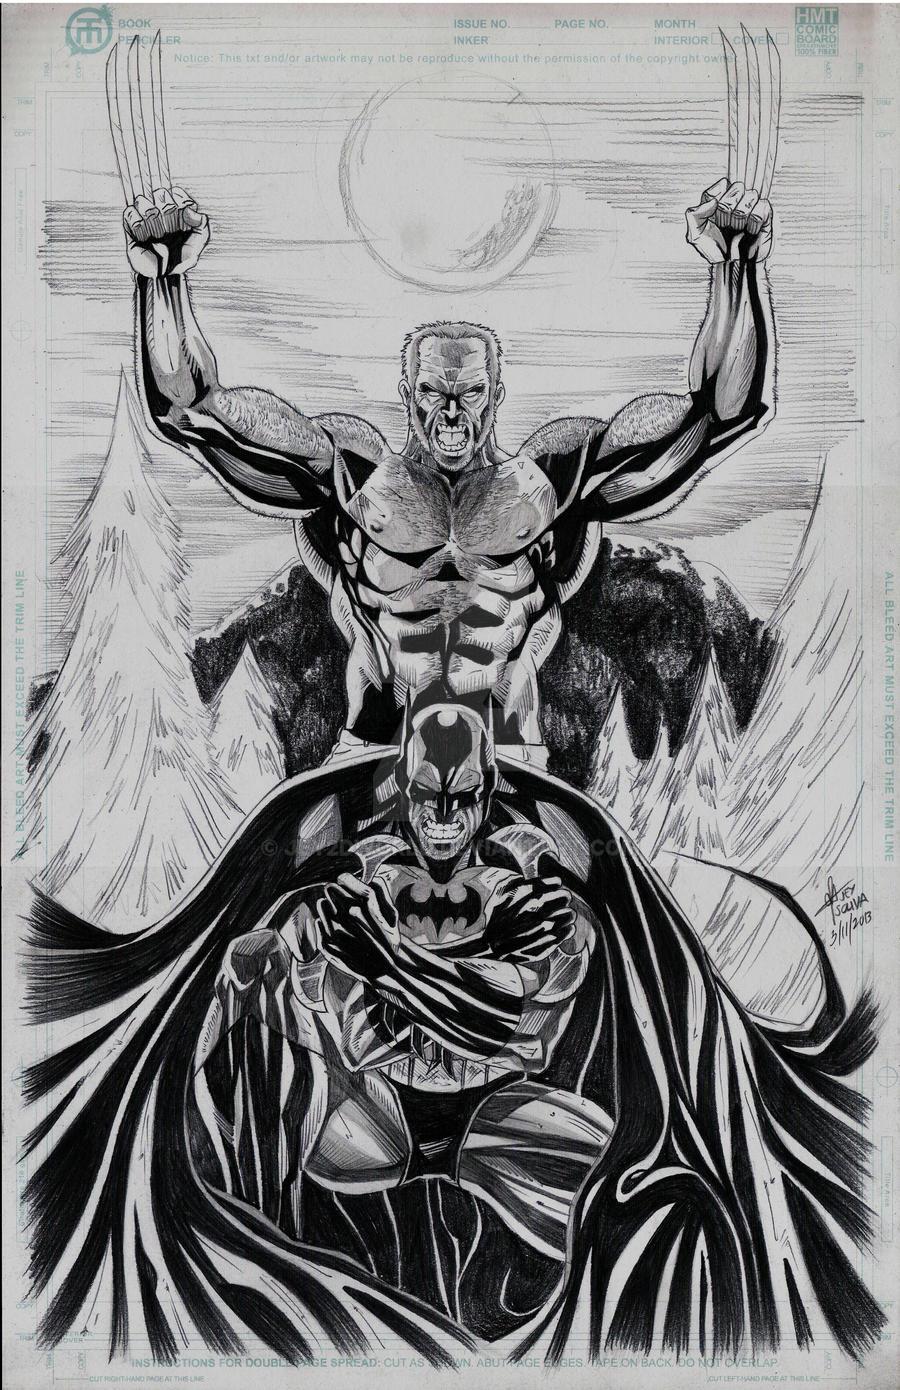 Old Man Logan With The Dark Knight Returns By Jey2dworld On Deviantart